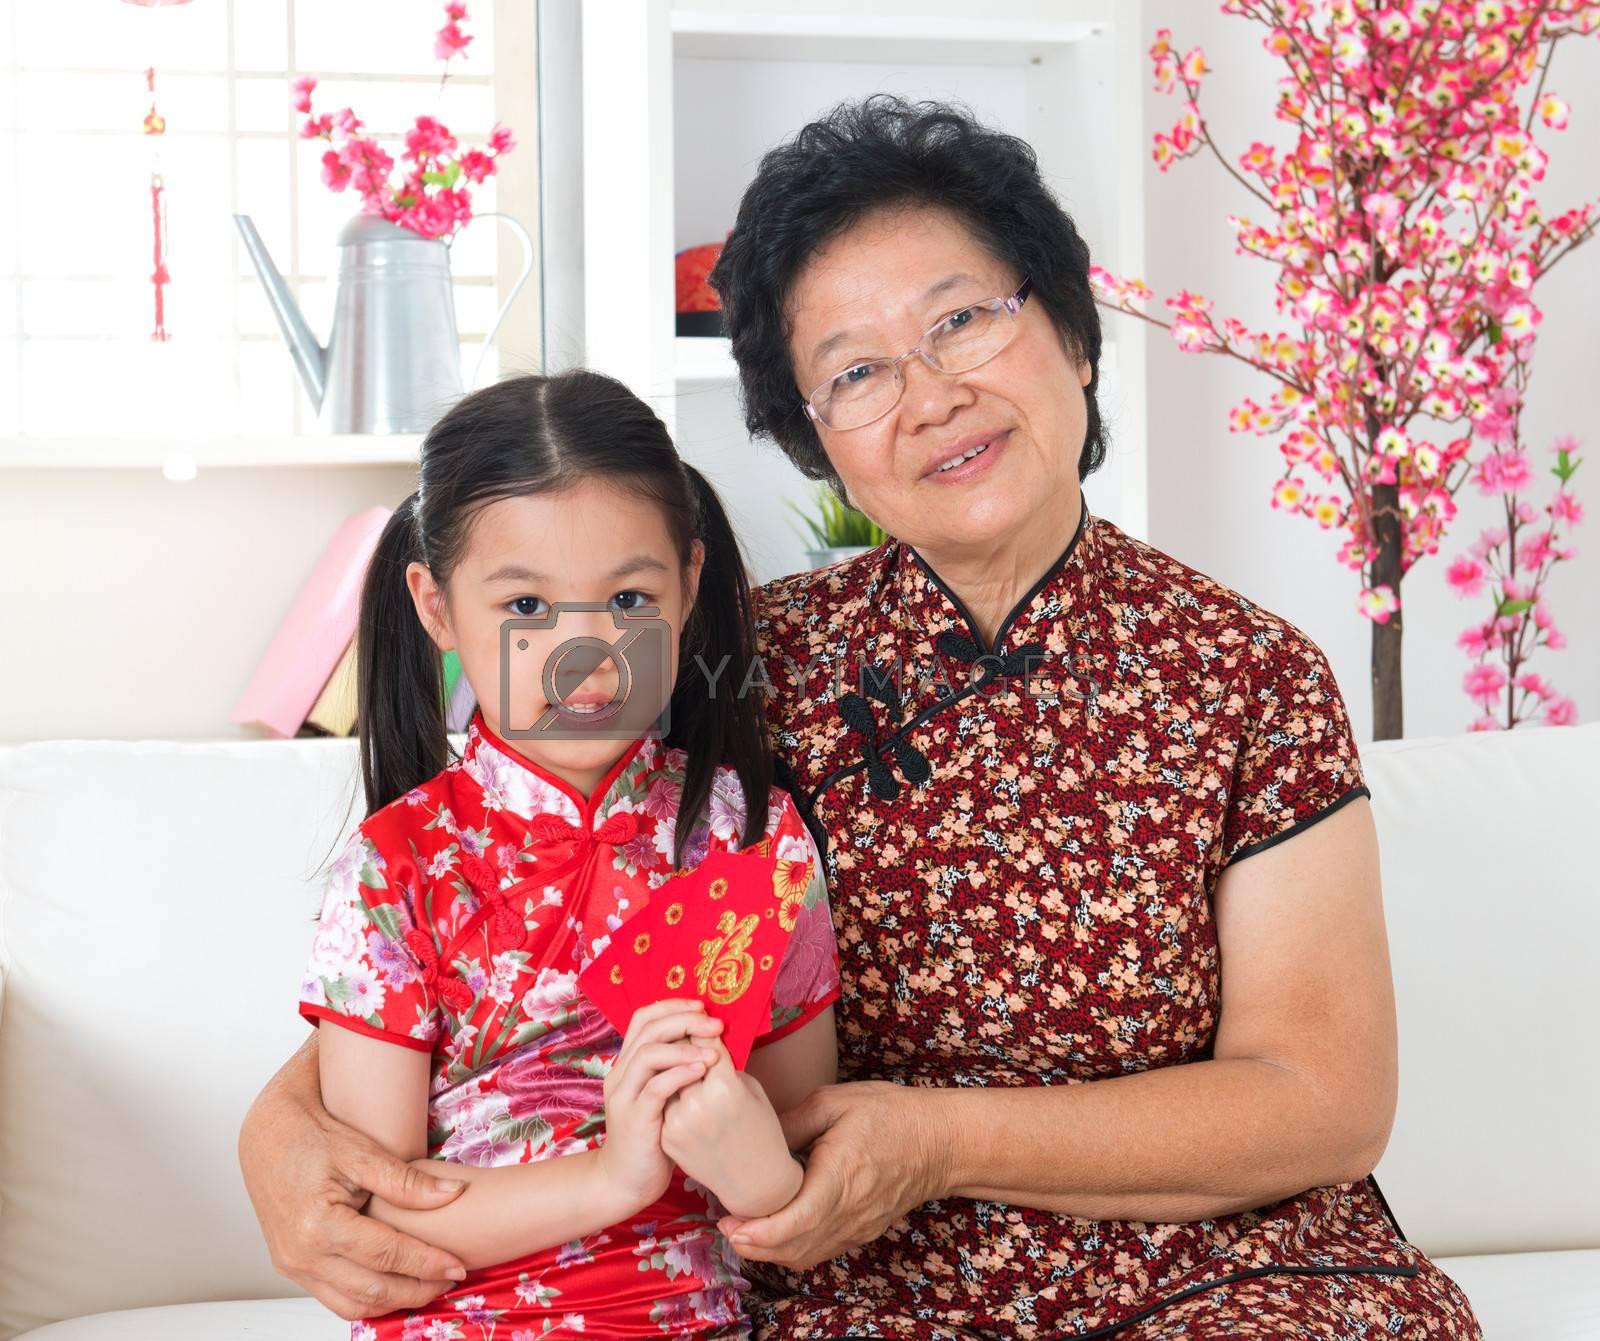 Beautiful grandparent and grandchild celebrate Chinese new year at home.